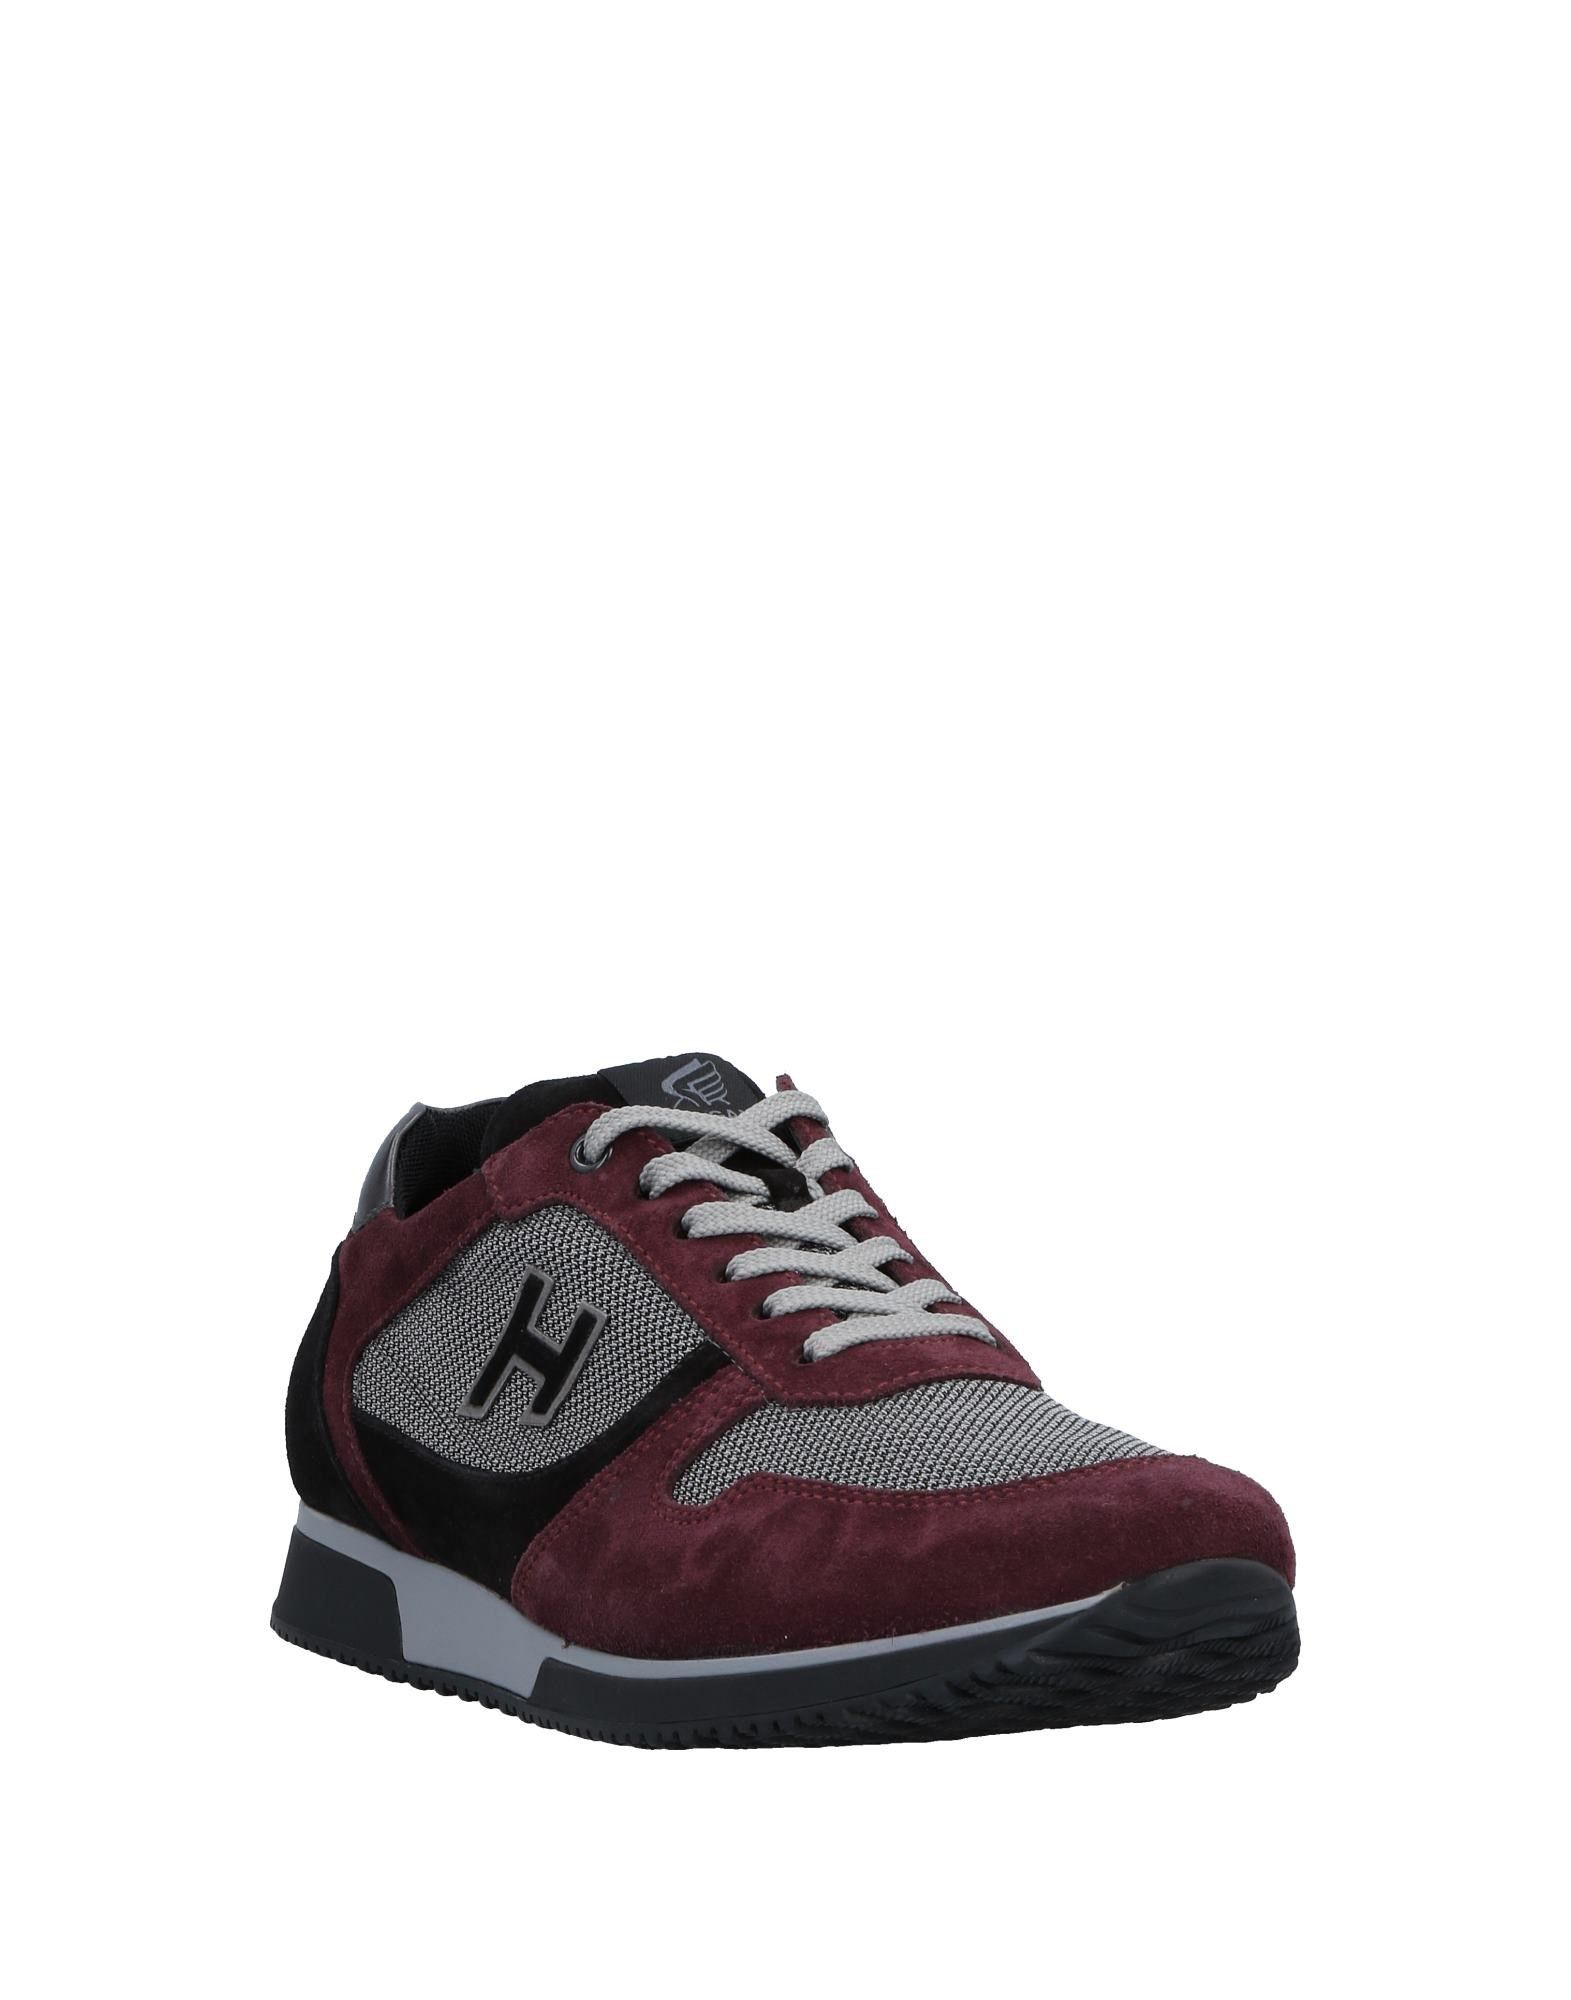 A buon mercato Sneakers Hogan Uomo - 11533184UQ